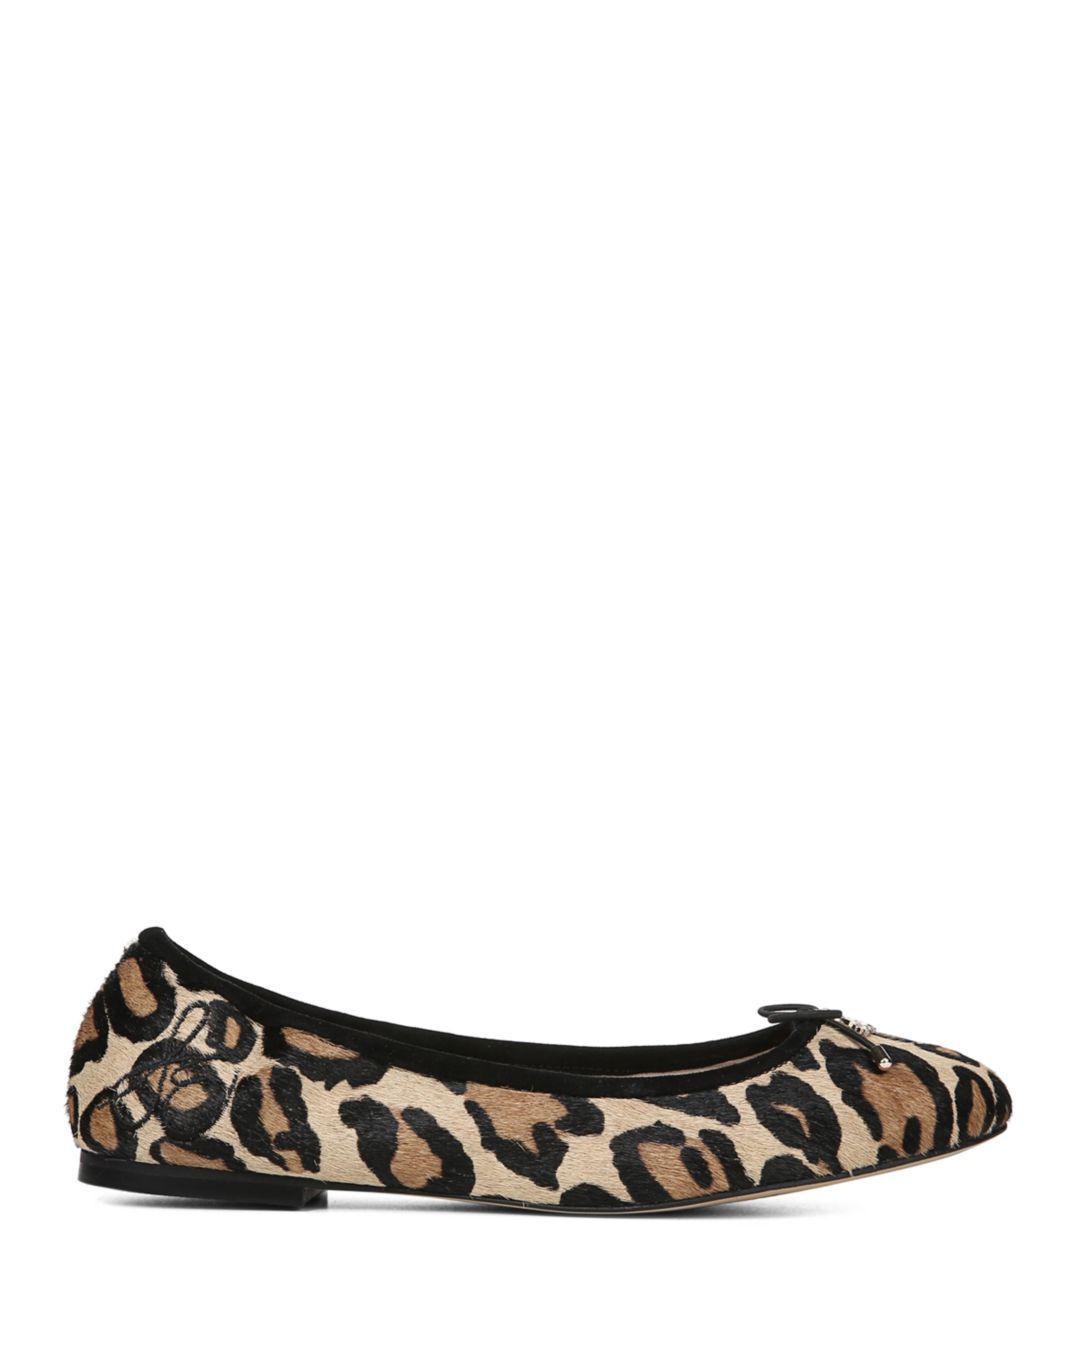 4ef5c8fe7a3d9c Lyst - Sam Edelman Women s Felicia Round Toe Leopard-print Calf Hair Ballet  Flats